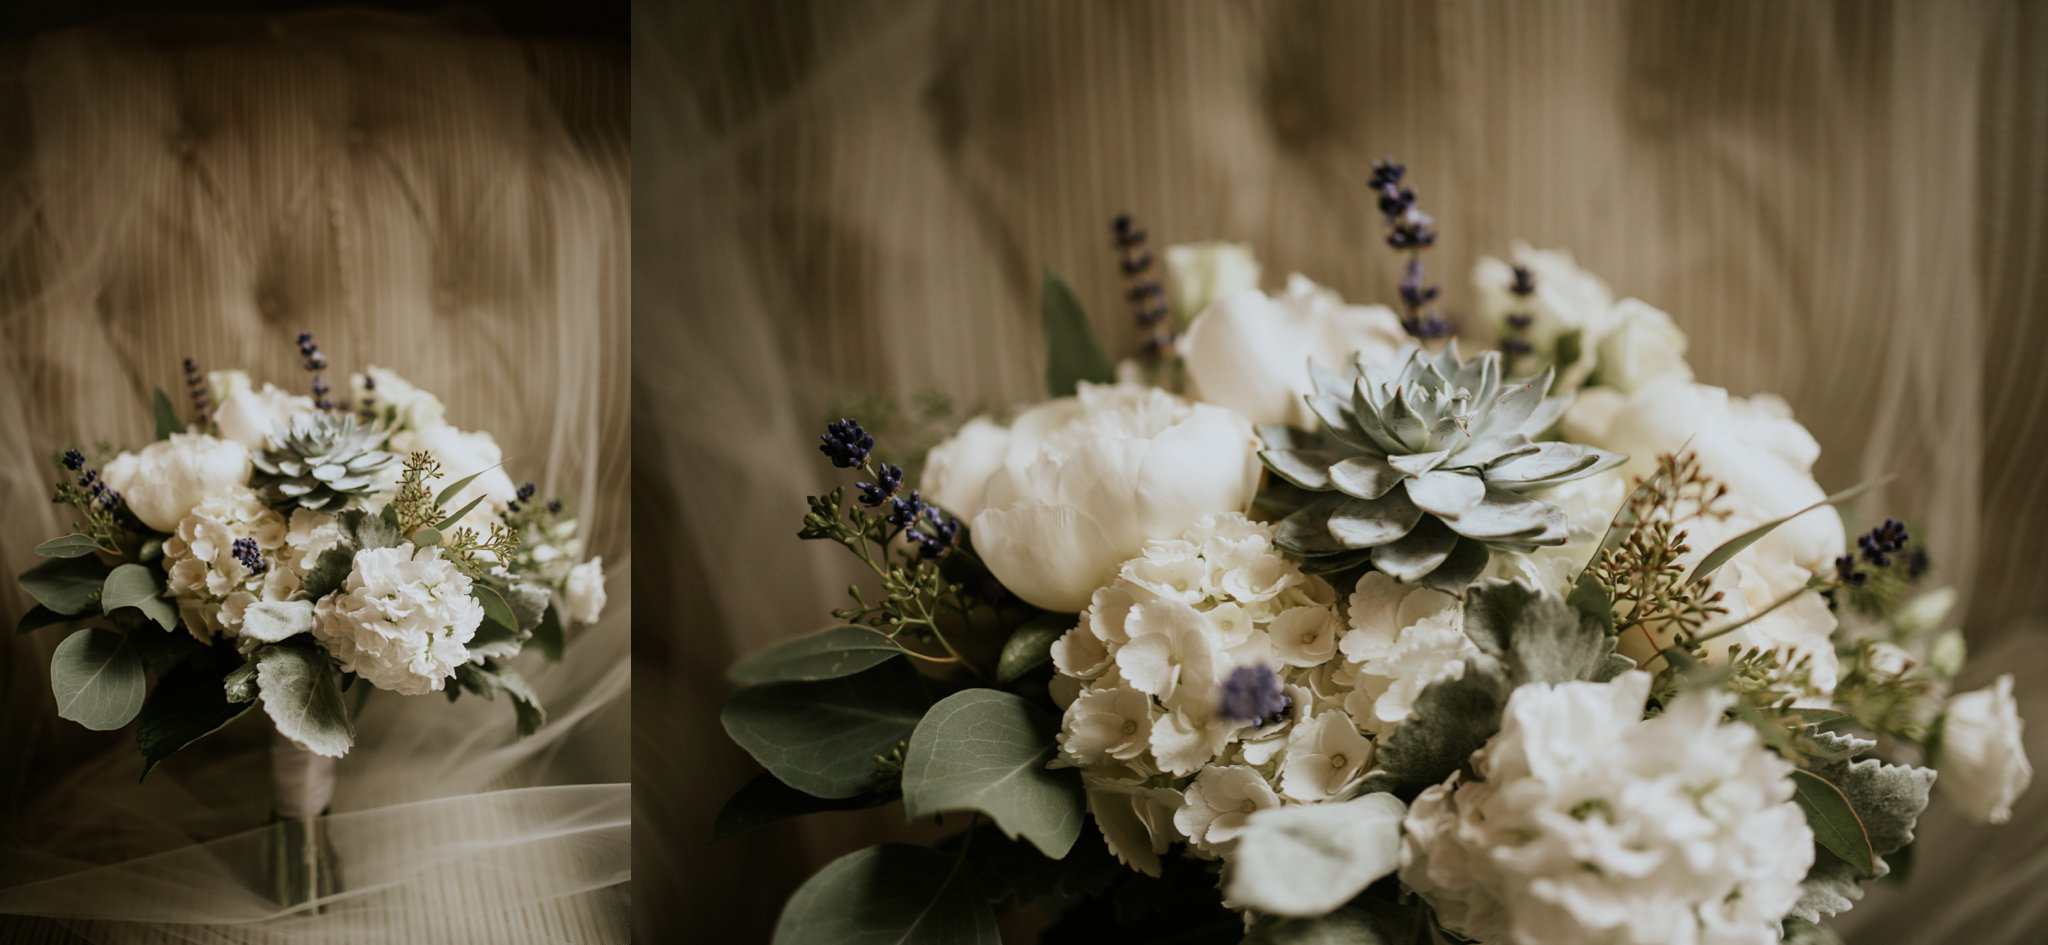 hollywood-school-house-wedding-seattle-photographer-caitlyn-nikula-7.jpg